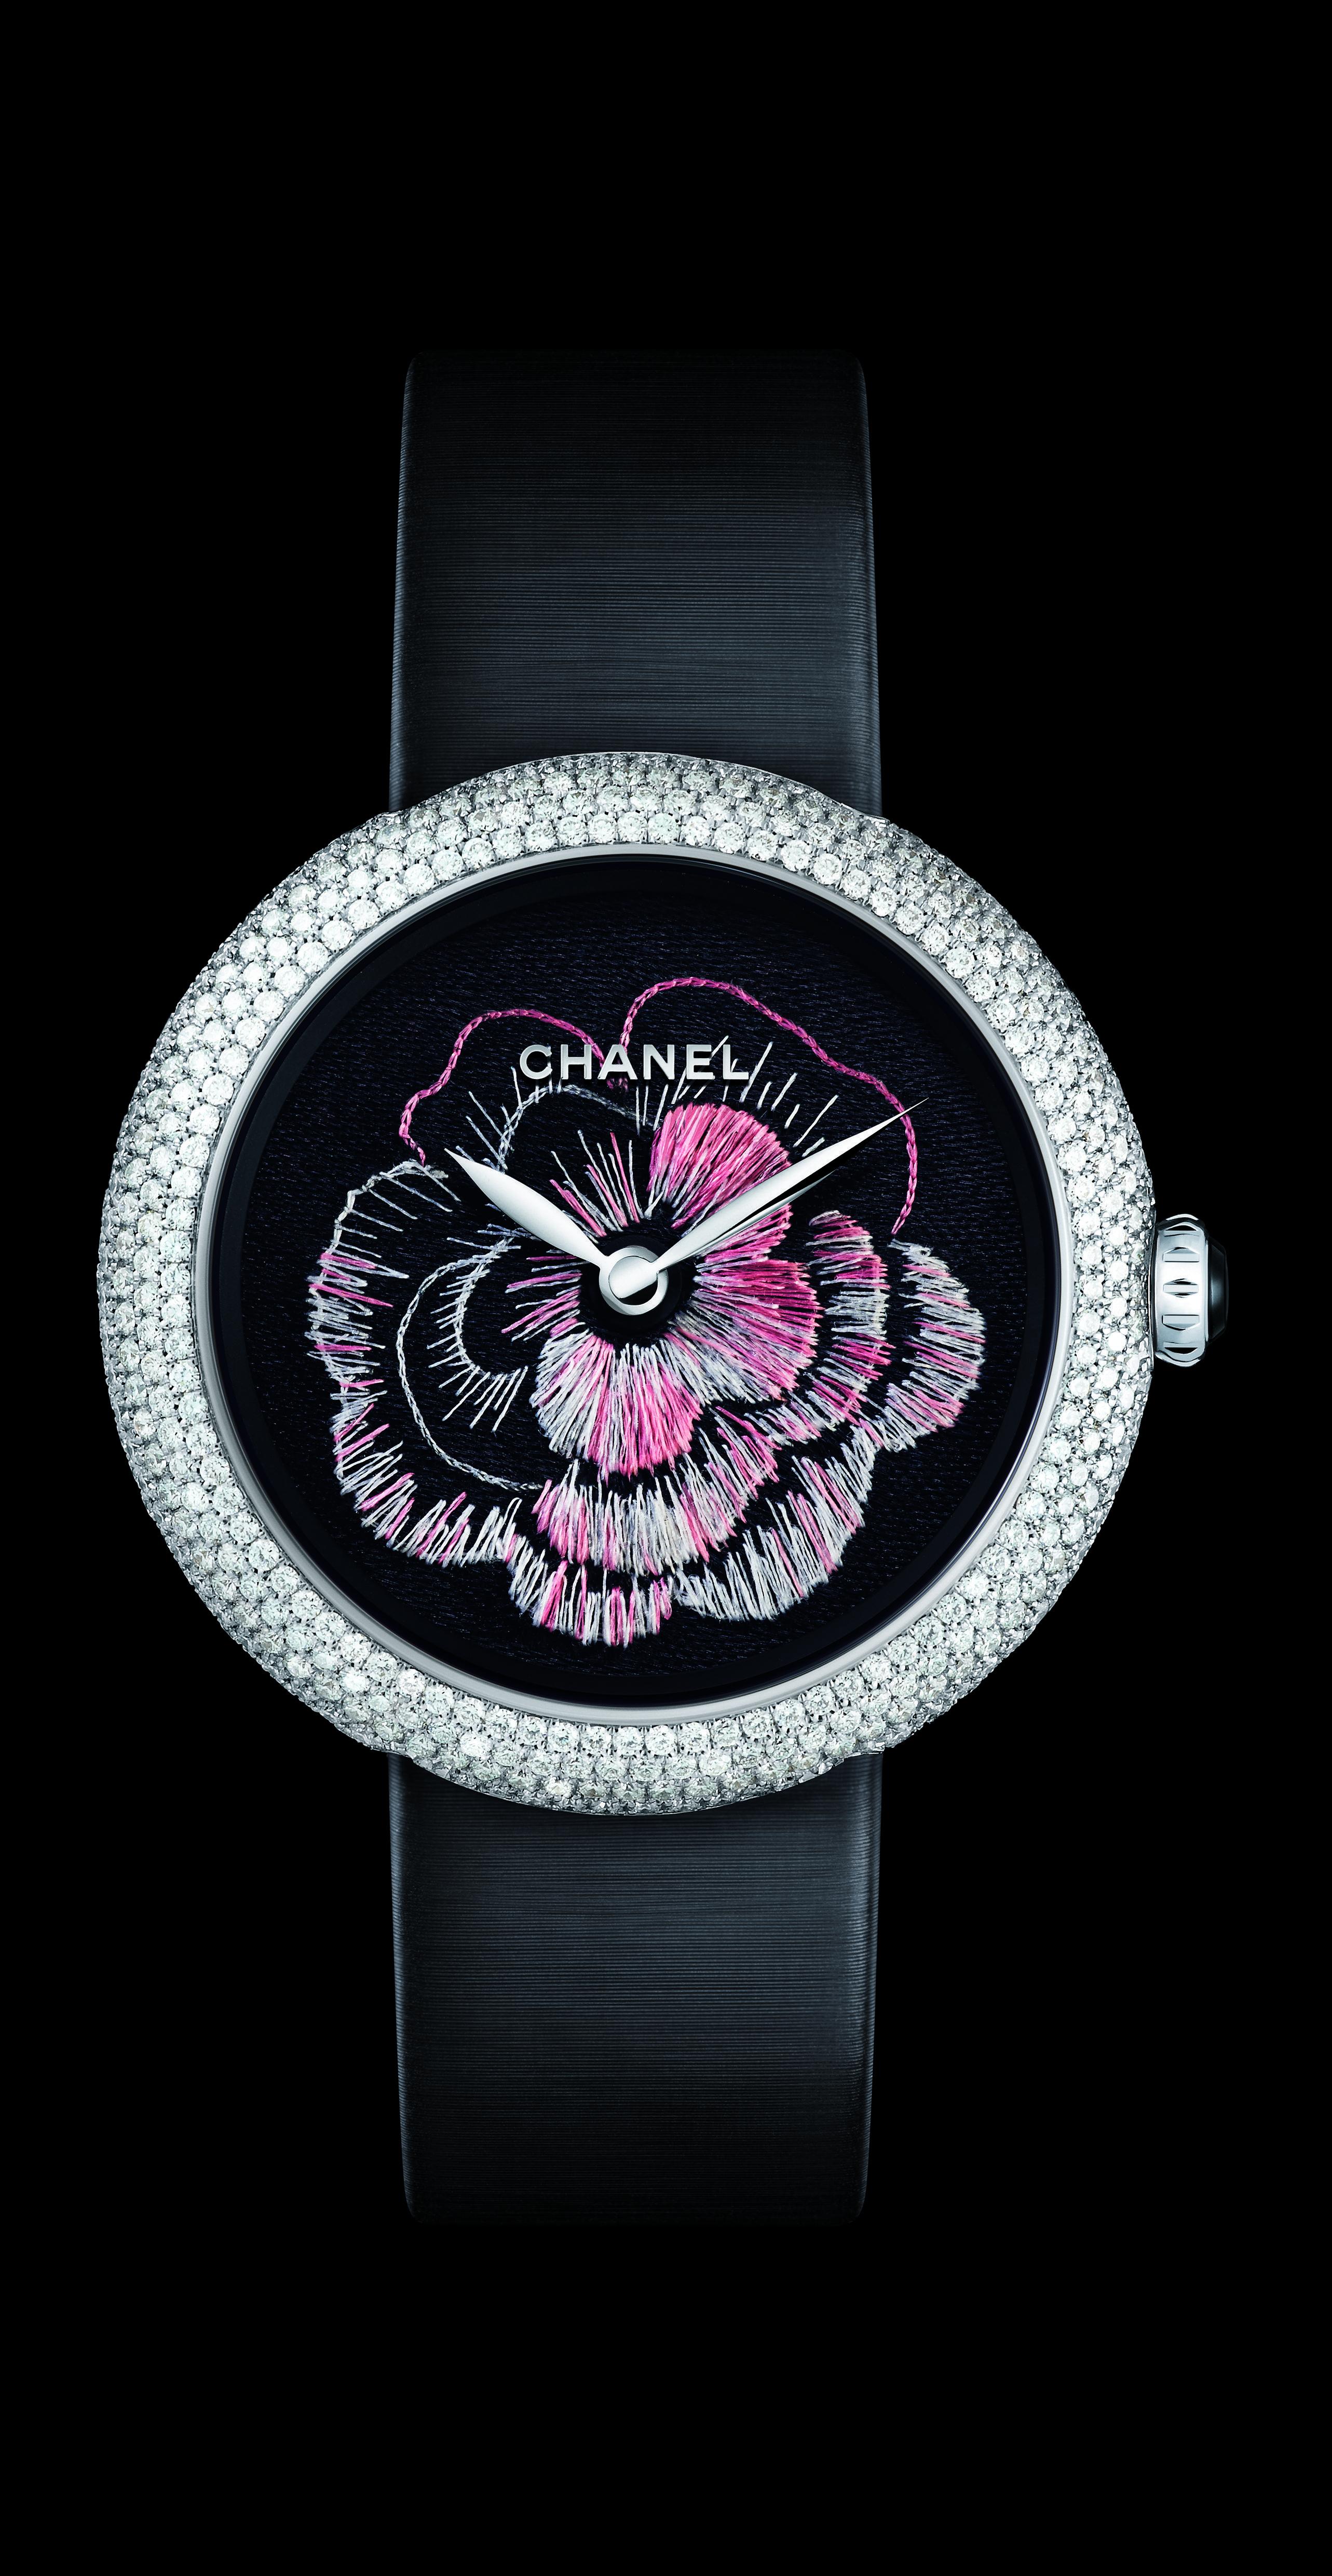 Mademoiselle chanel prive watch craftsmanship foto